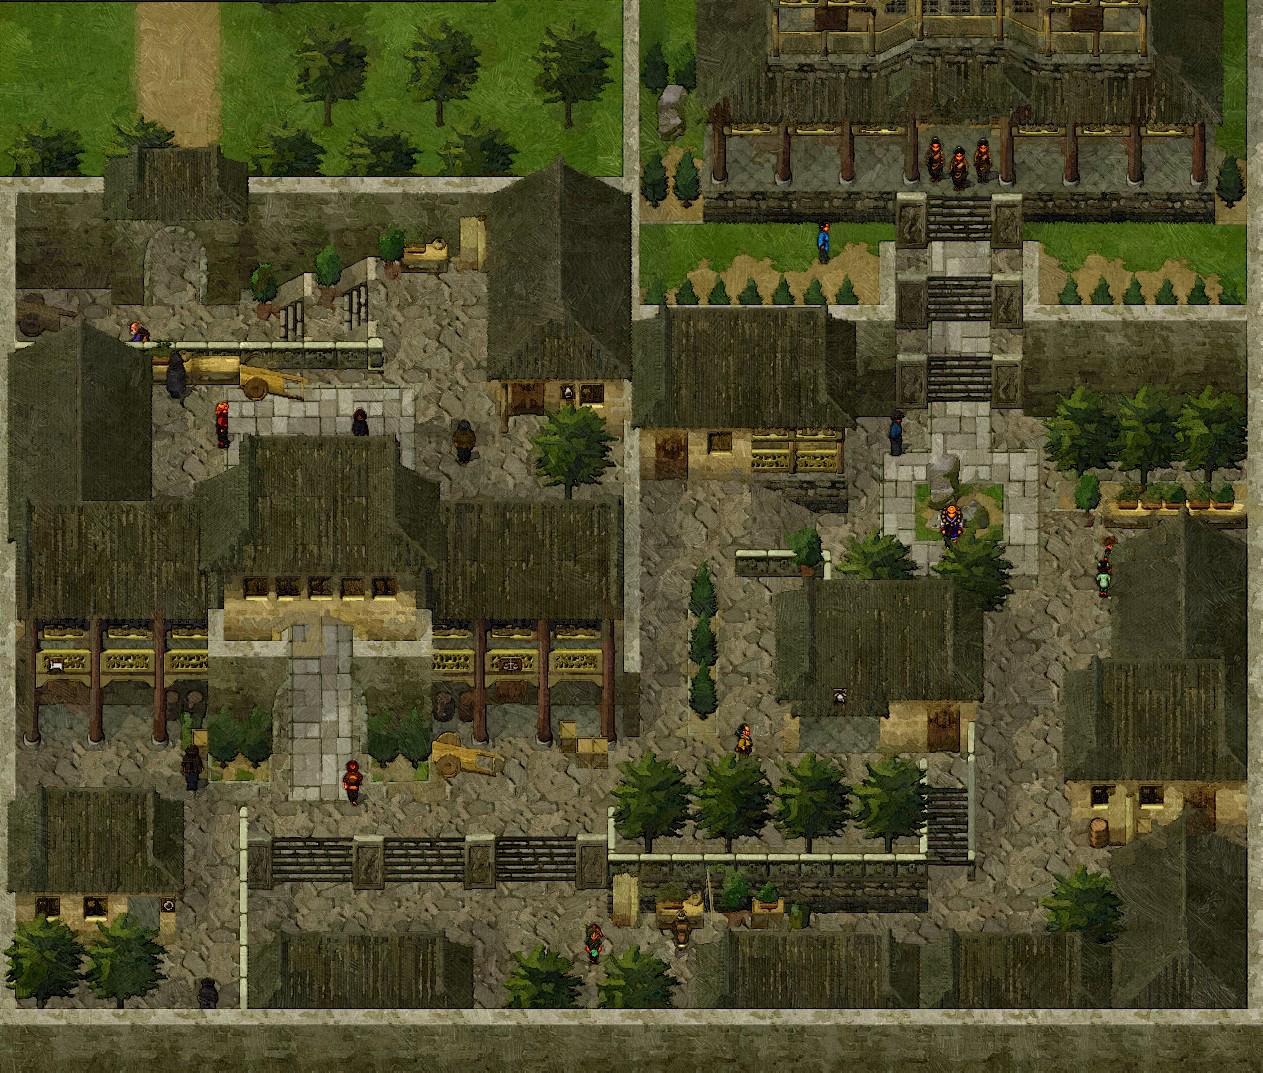 Suikoden 2 Map